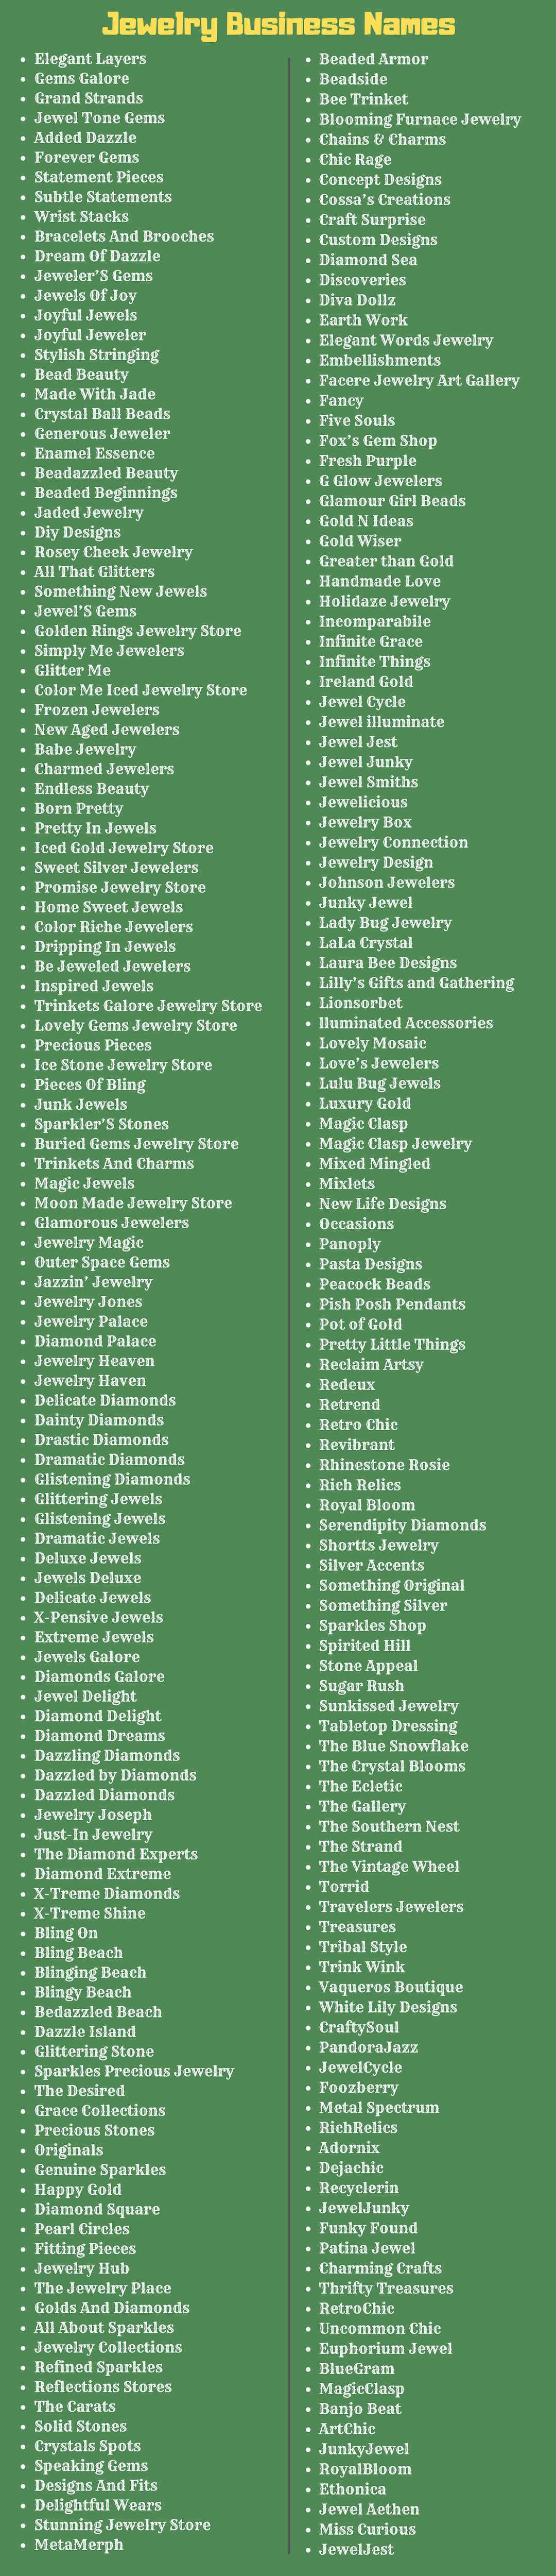 Jewelry Business Names 300+ Good Jewelry Brand Name Ideas